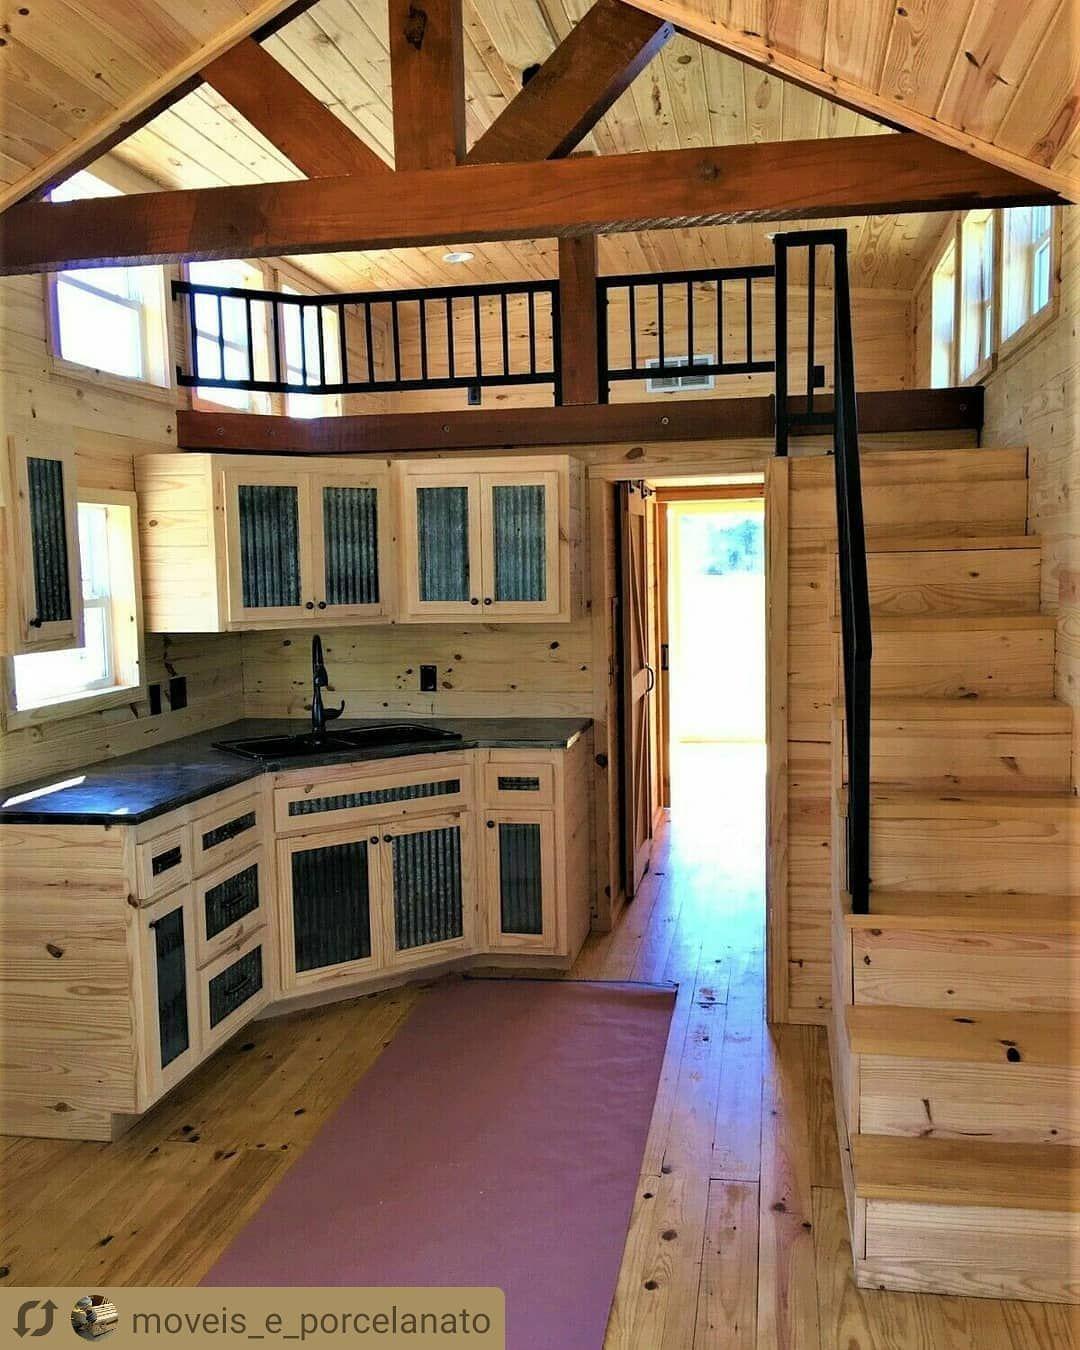 . . #Repost @moveis_e_porcelanato • • • • . . . #yourdecorationstore #дървени #gardendecor #table # #cozyhome #home#woodenfurniture #design #екстериор #bulgaria ##homedecorideas #интериор #homedecorationideas #homedecorshop #homedecorstore #homedecoratingideas #homedecoritems #homedecorproducts